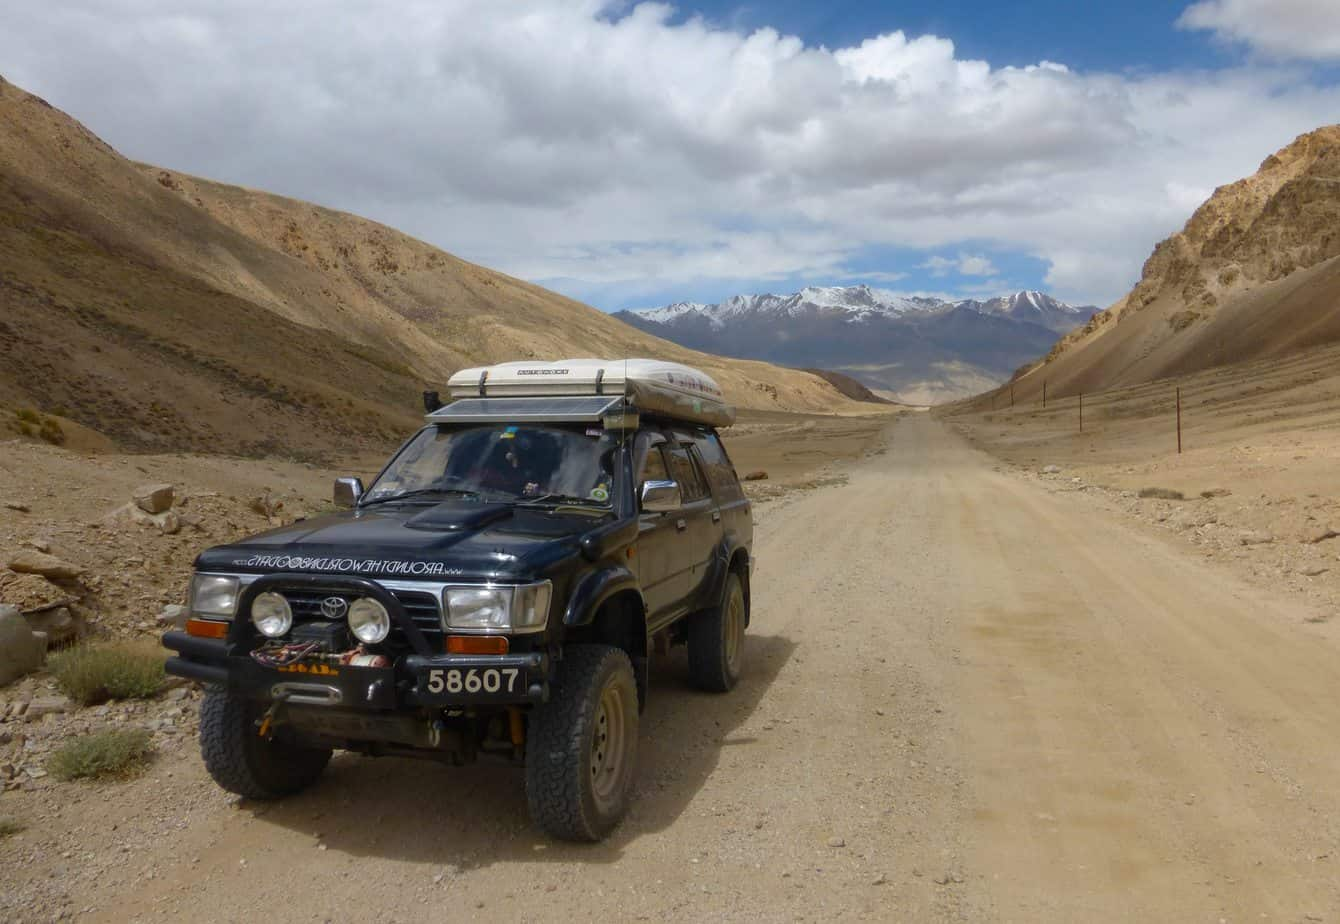 Heading towards the Uy Buloq Pass